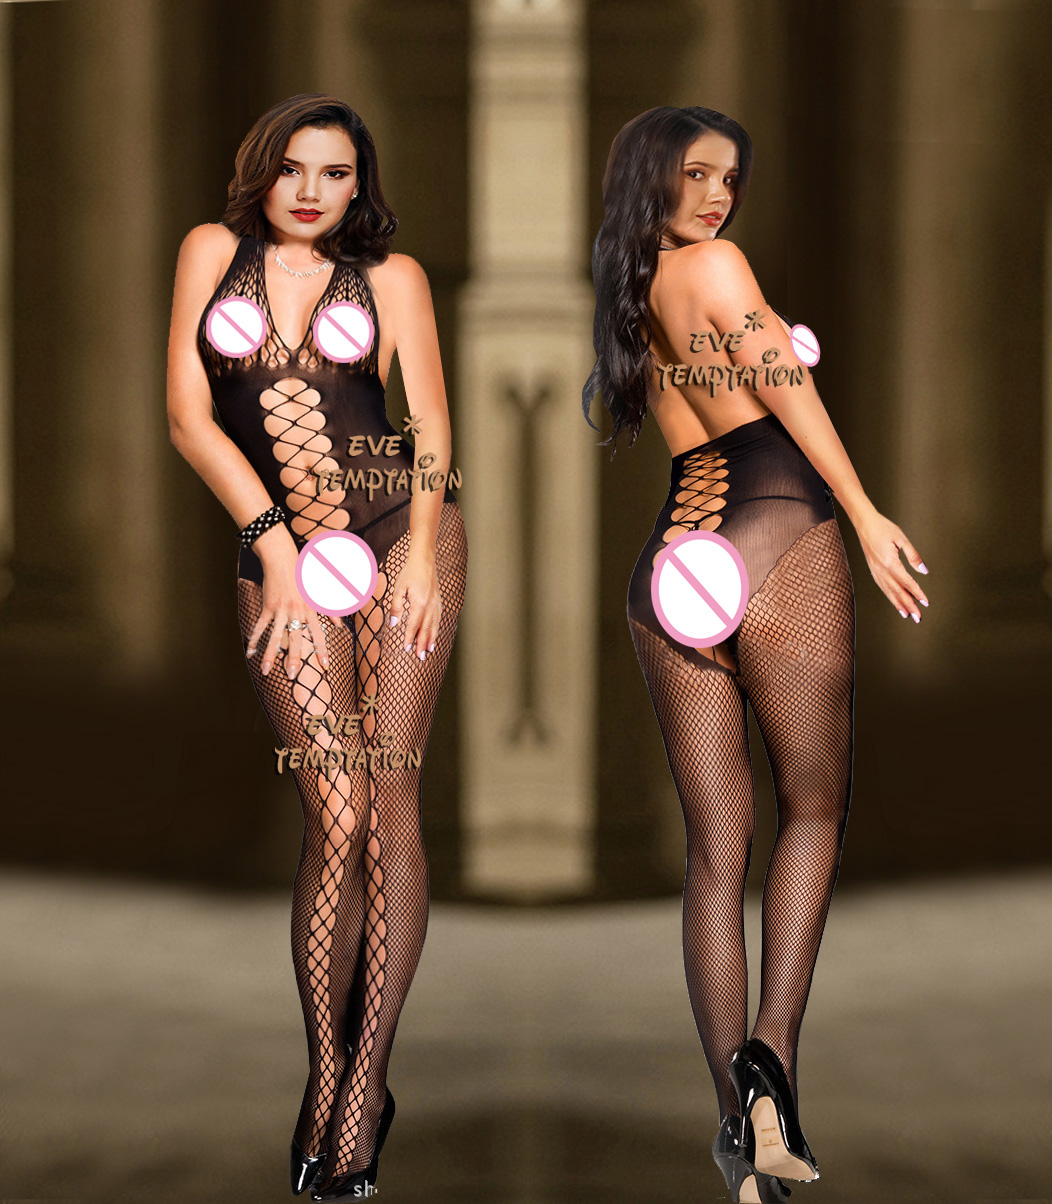 Buy Sexy Sleepwear Lingerie Babydoll BODYSUIT Mesh Body Stocking Temptation Intimate Catsuit Nightwear Garter  6223